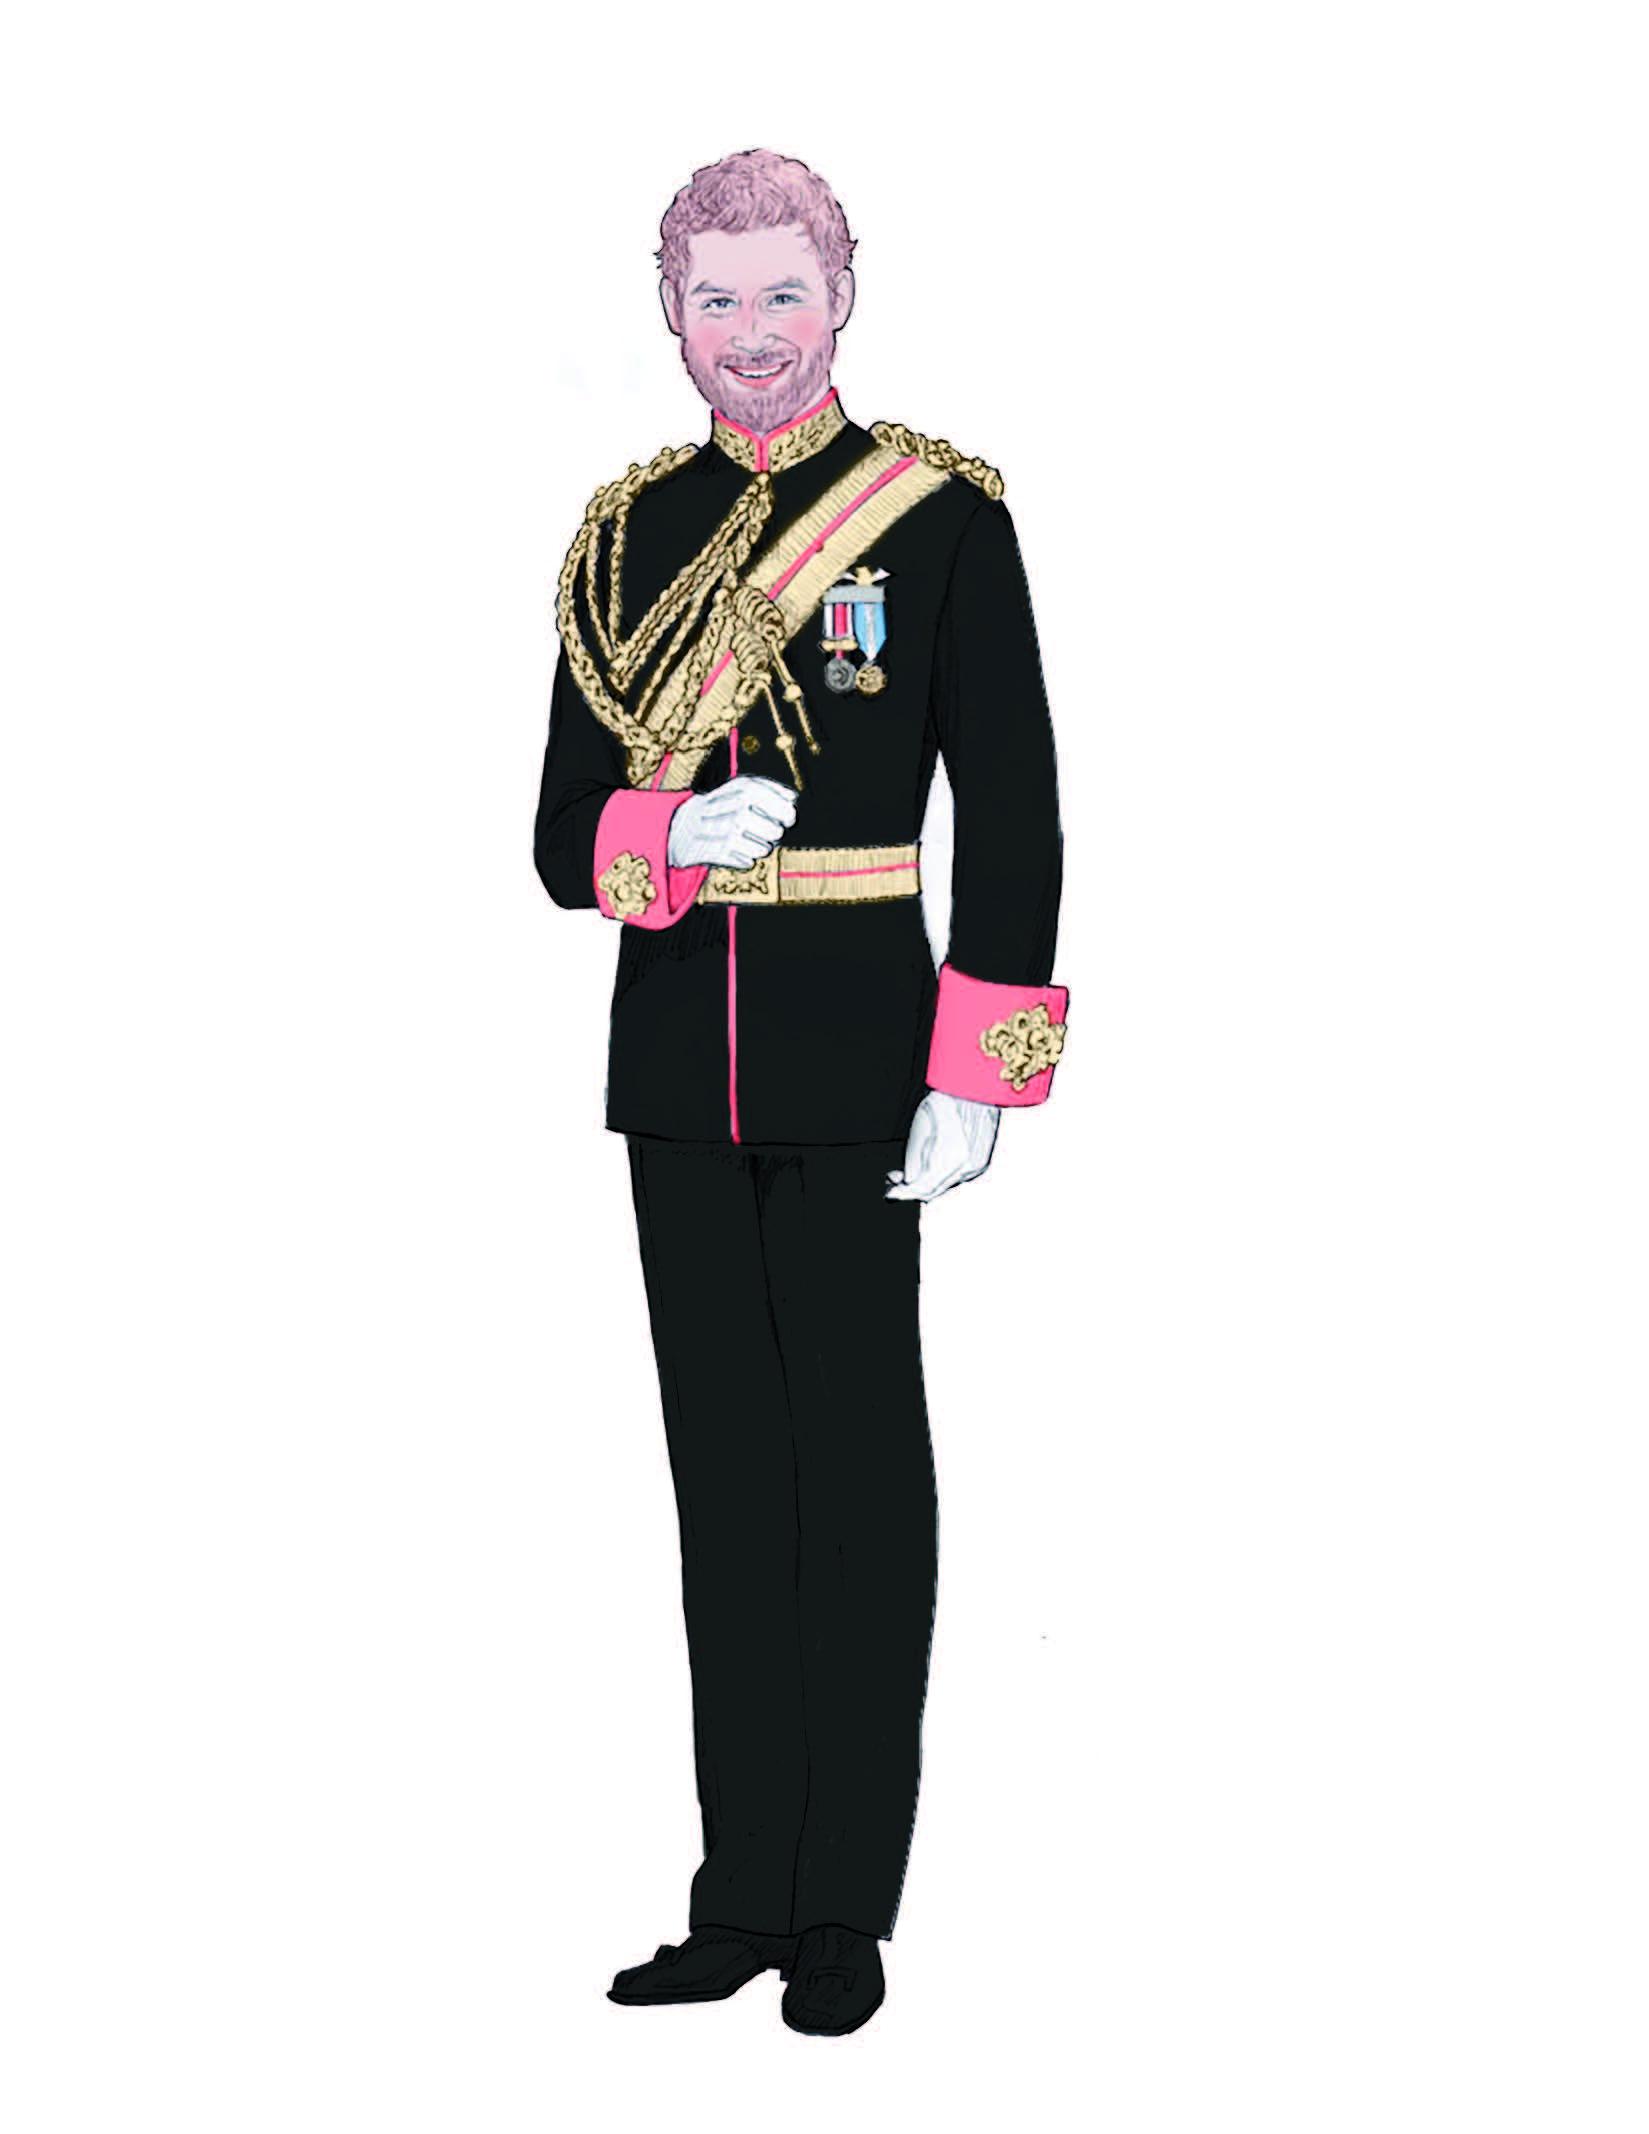 Prince Harry illustration by Ashton-Drake